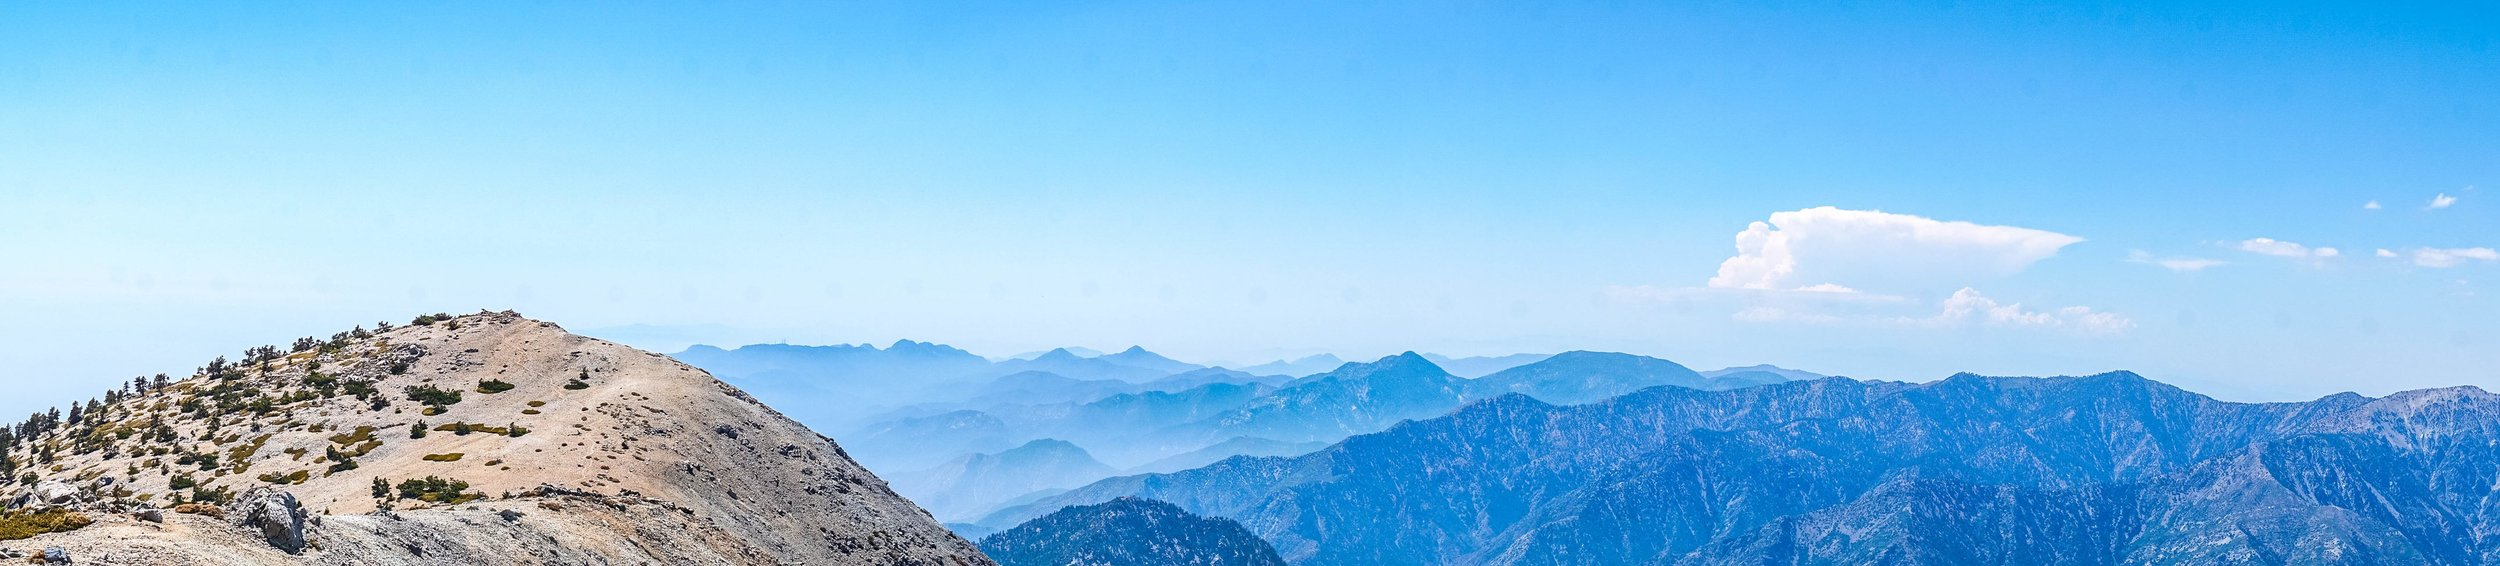 Baldy-Panorama.jpg